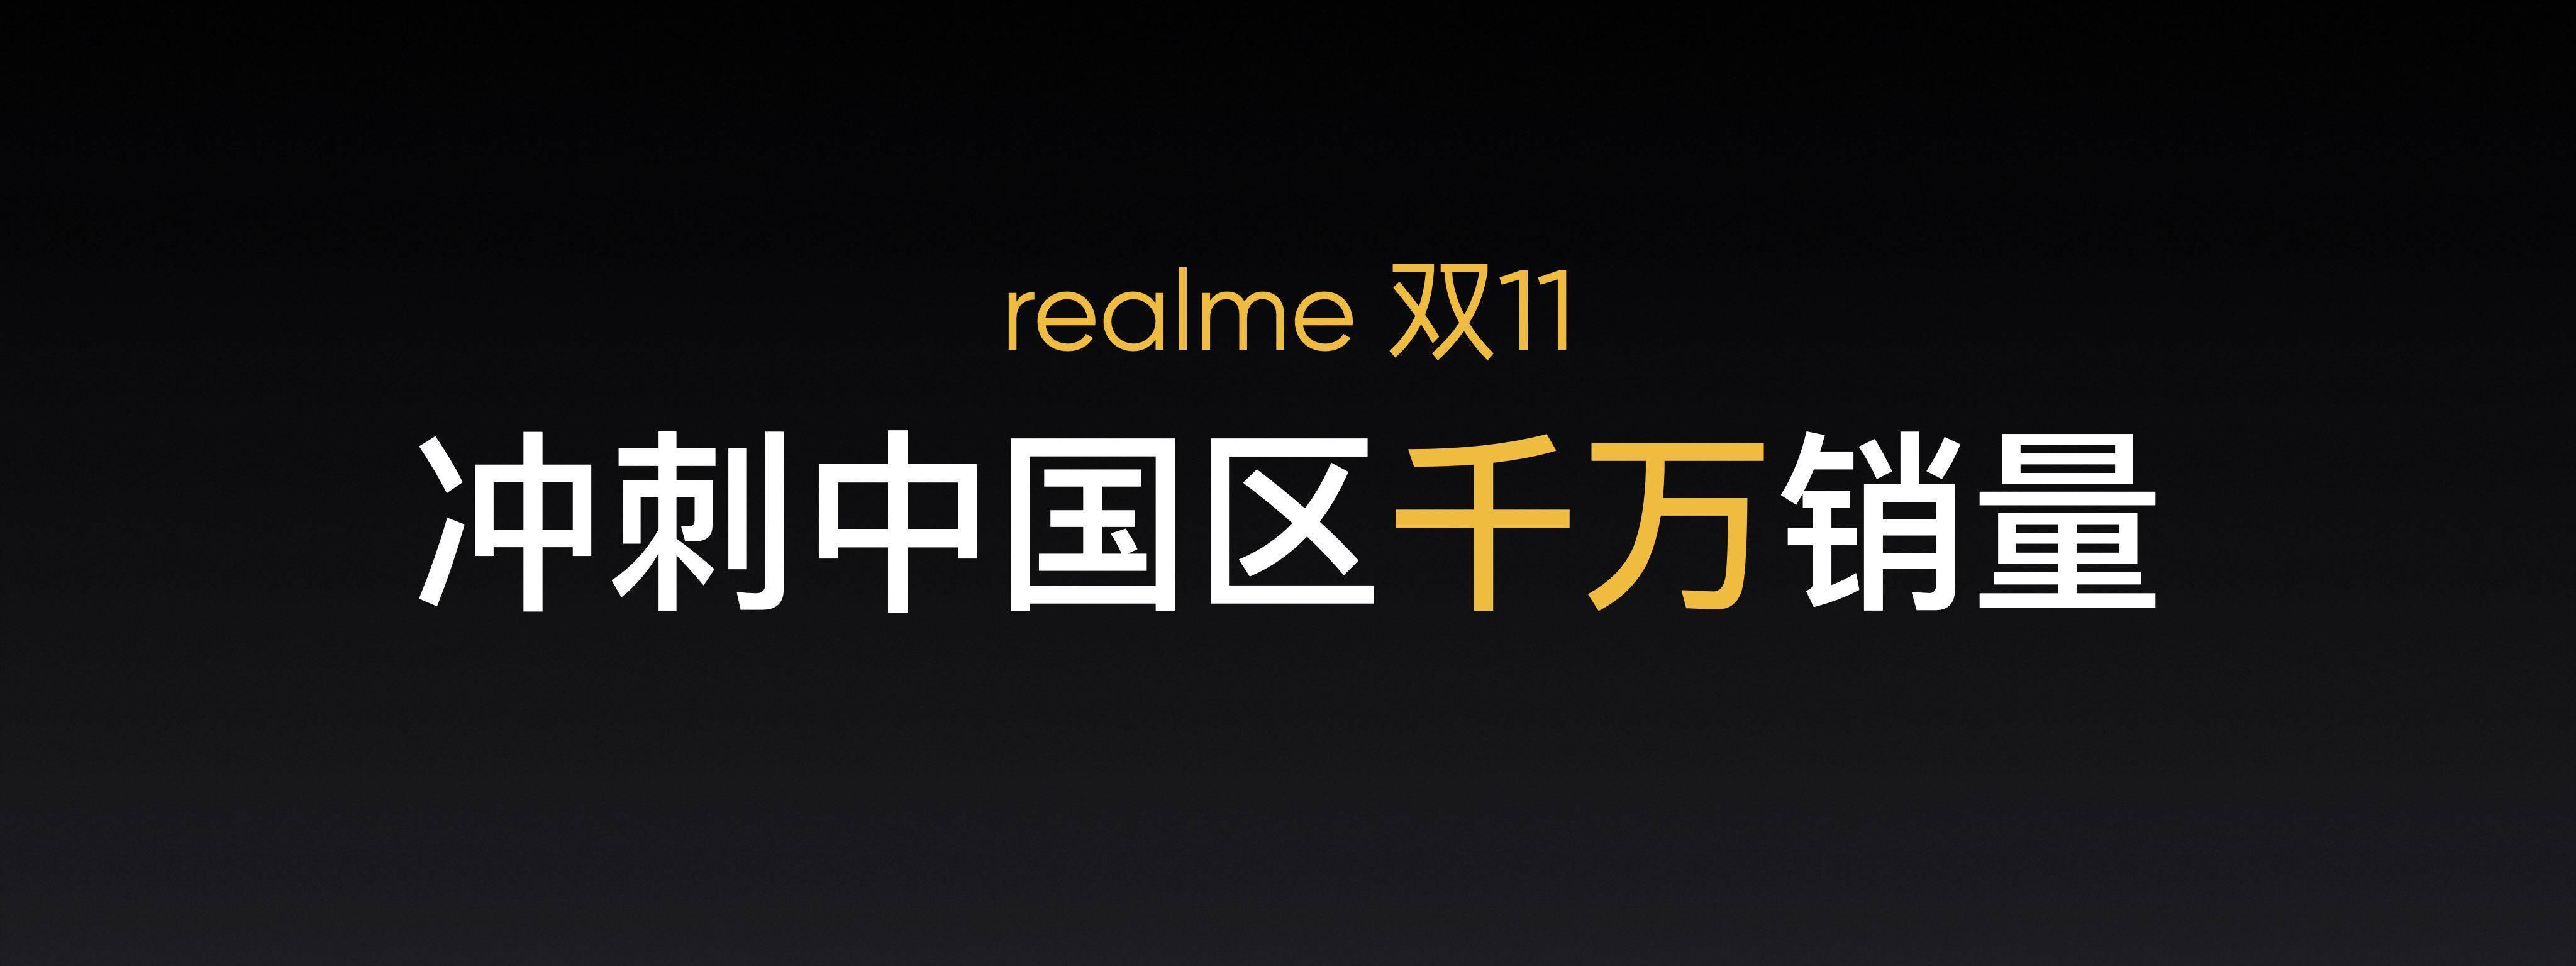 realme发布真我GTNeo2T等三款新品,打响双11第一枪zbt